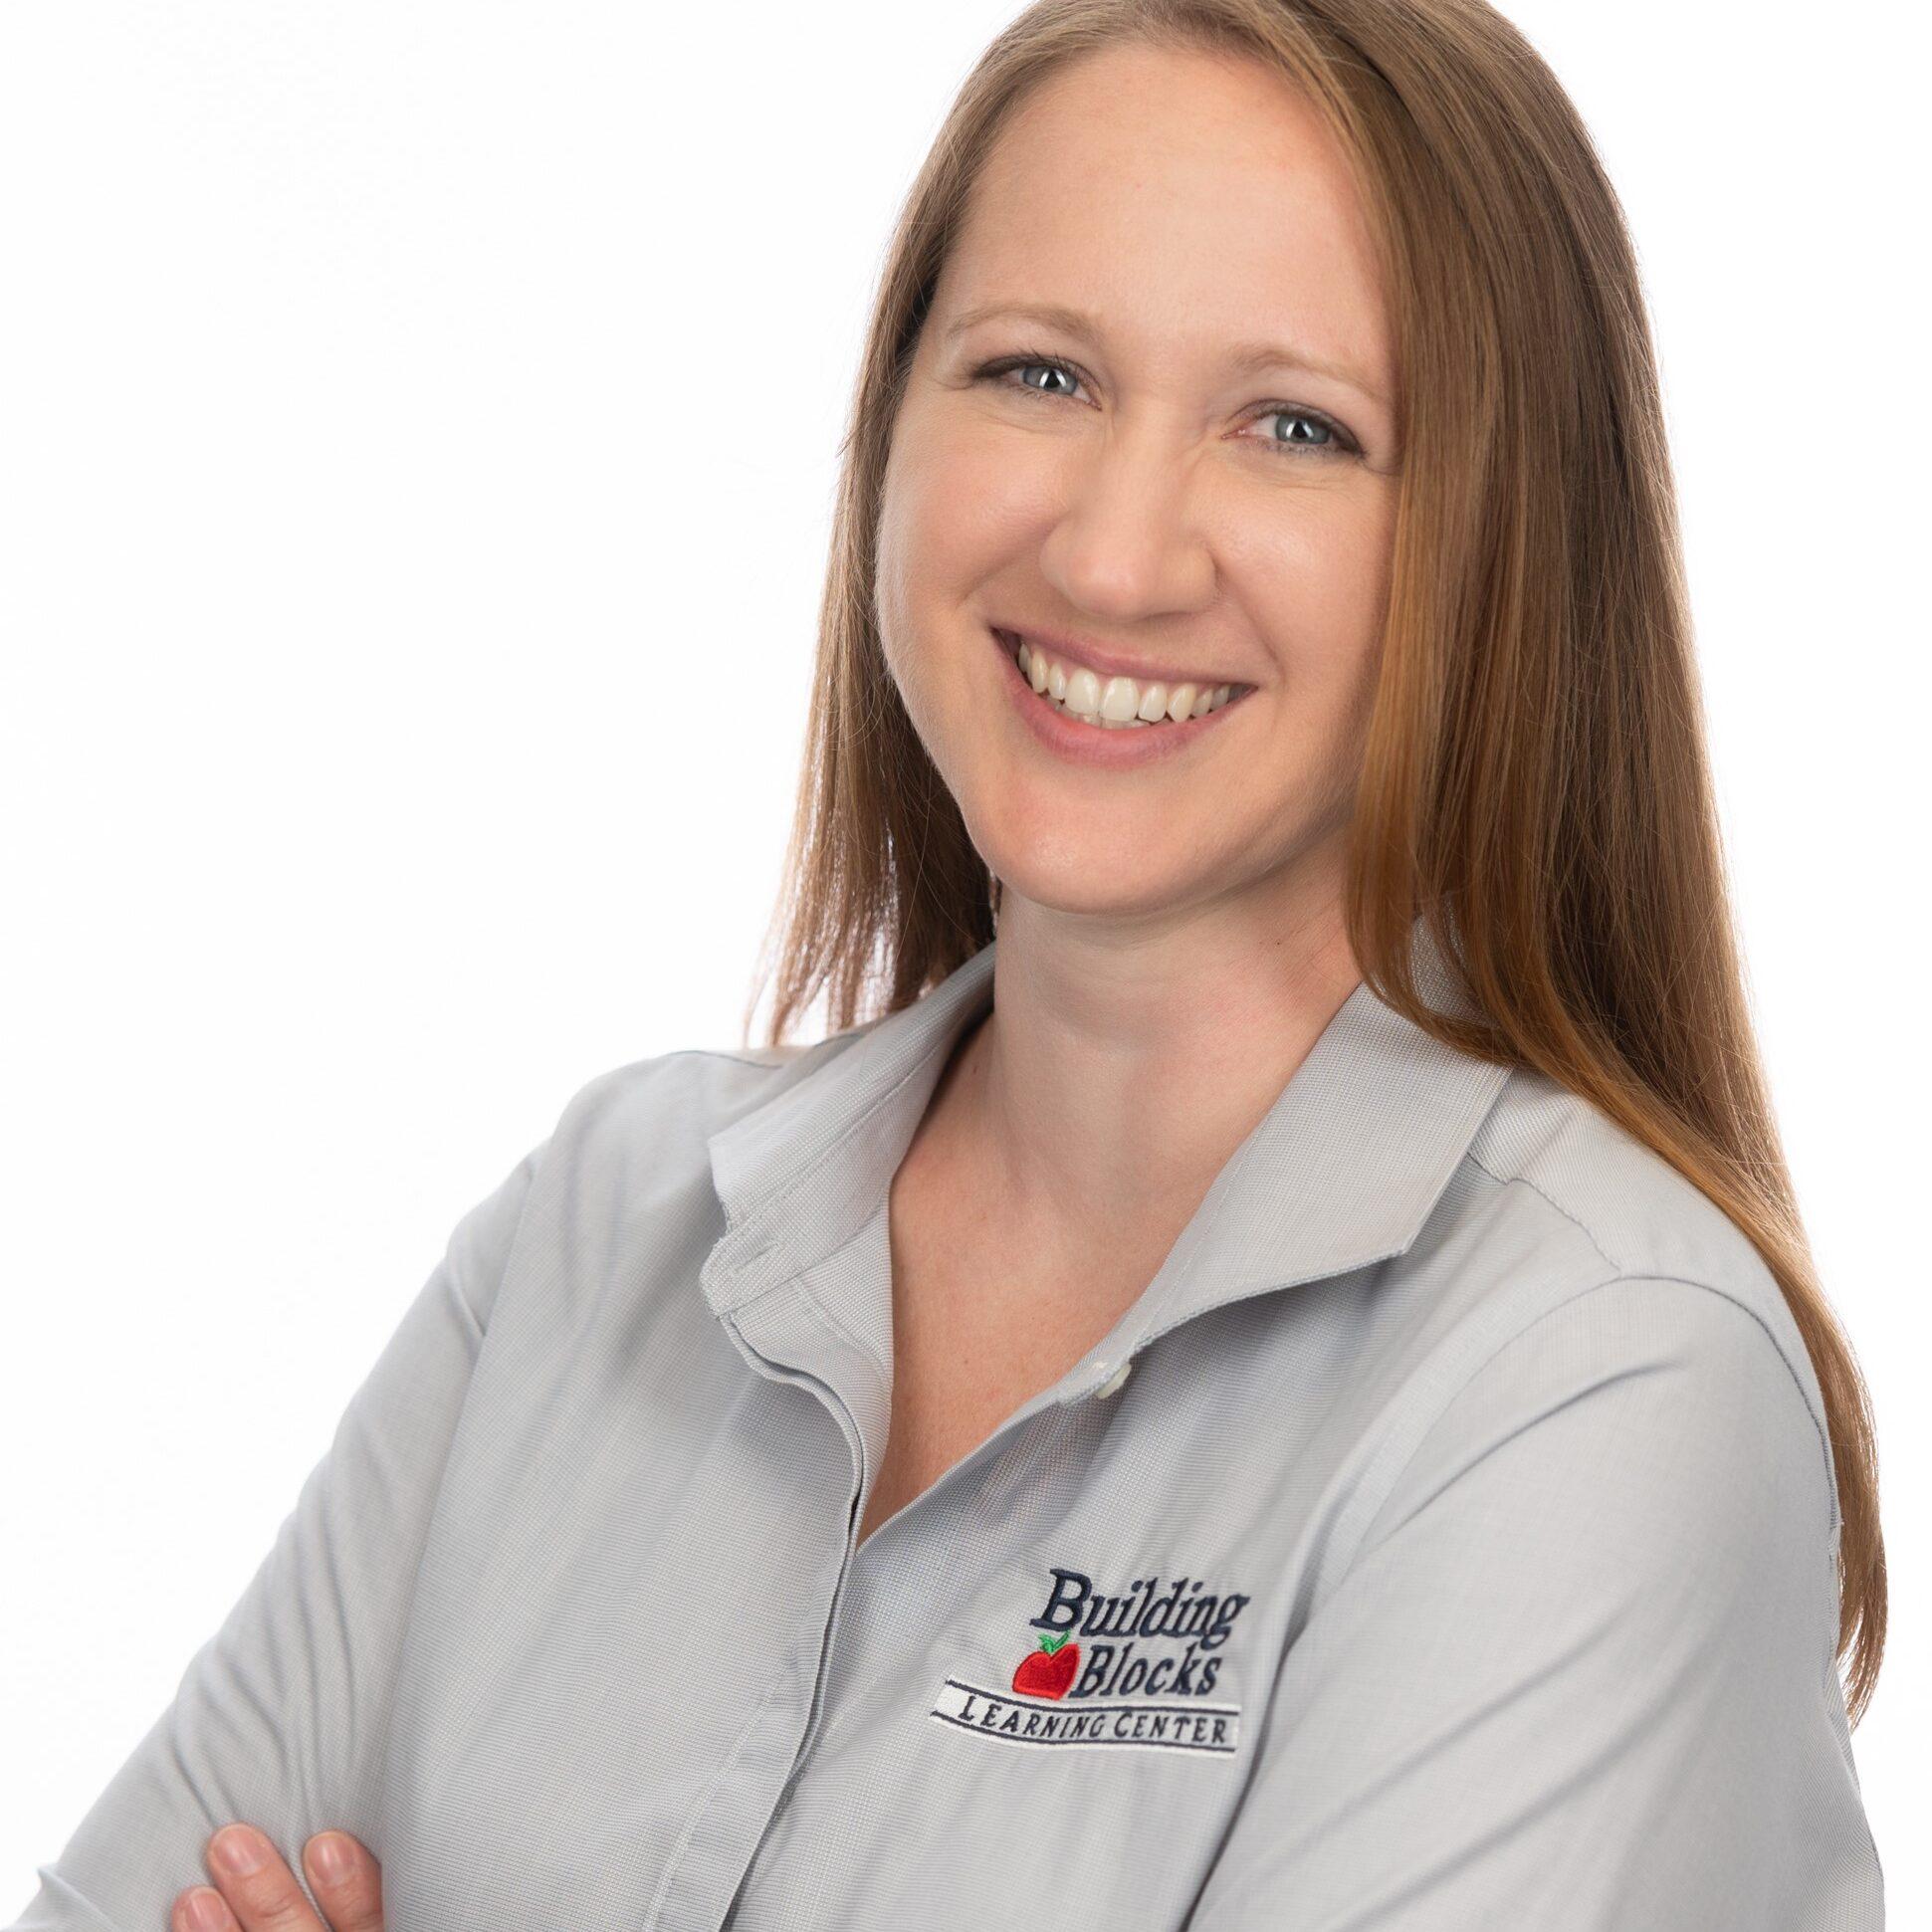 Allison Risick - BuildingBlocks- LOGO Headshot Update